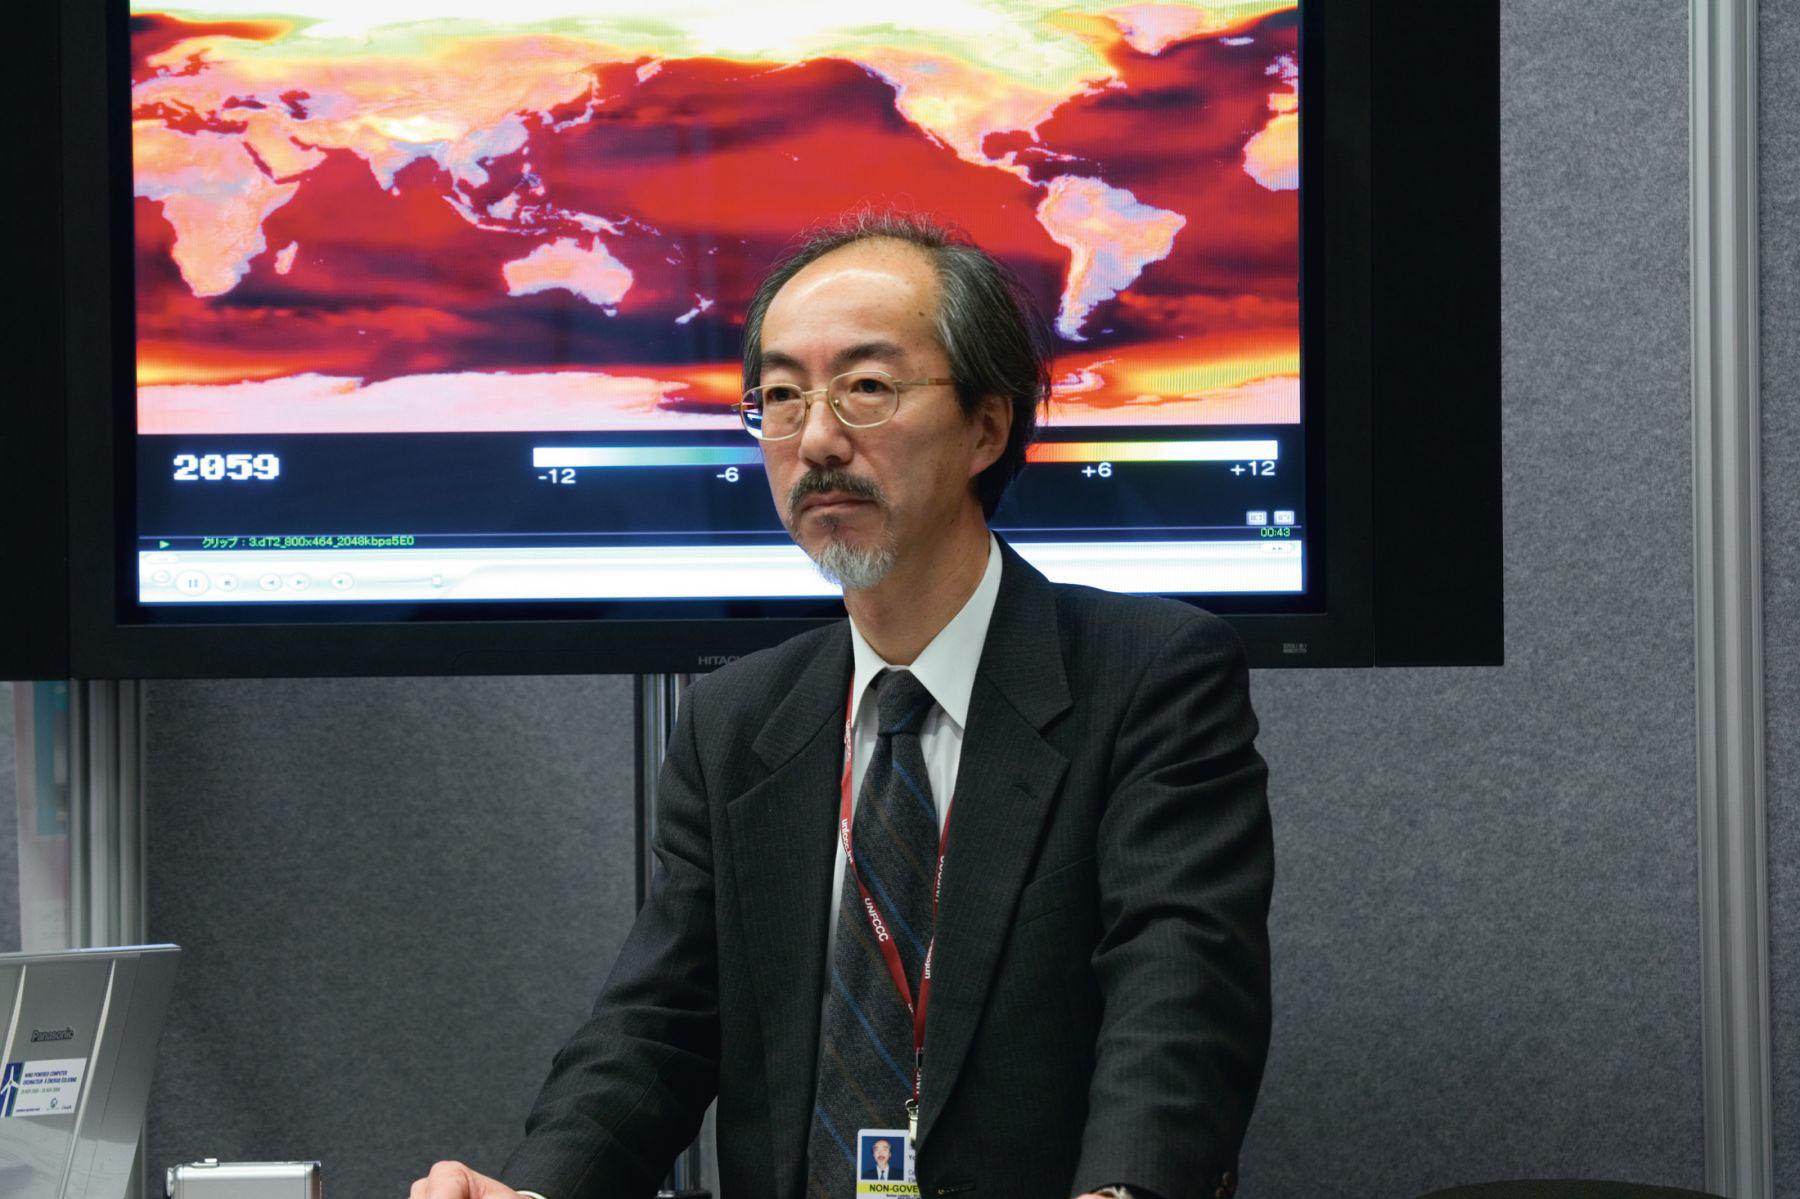 Yoshiaki Nishimura, Senior Staff, Central Research Institute of Electric Power Industry, Japan, 2005